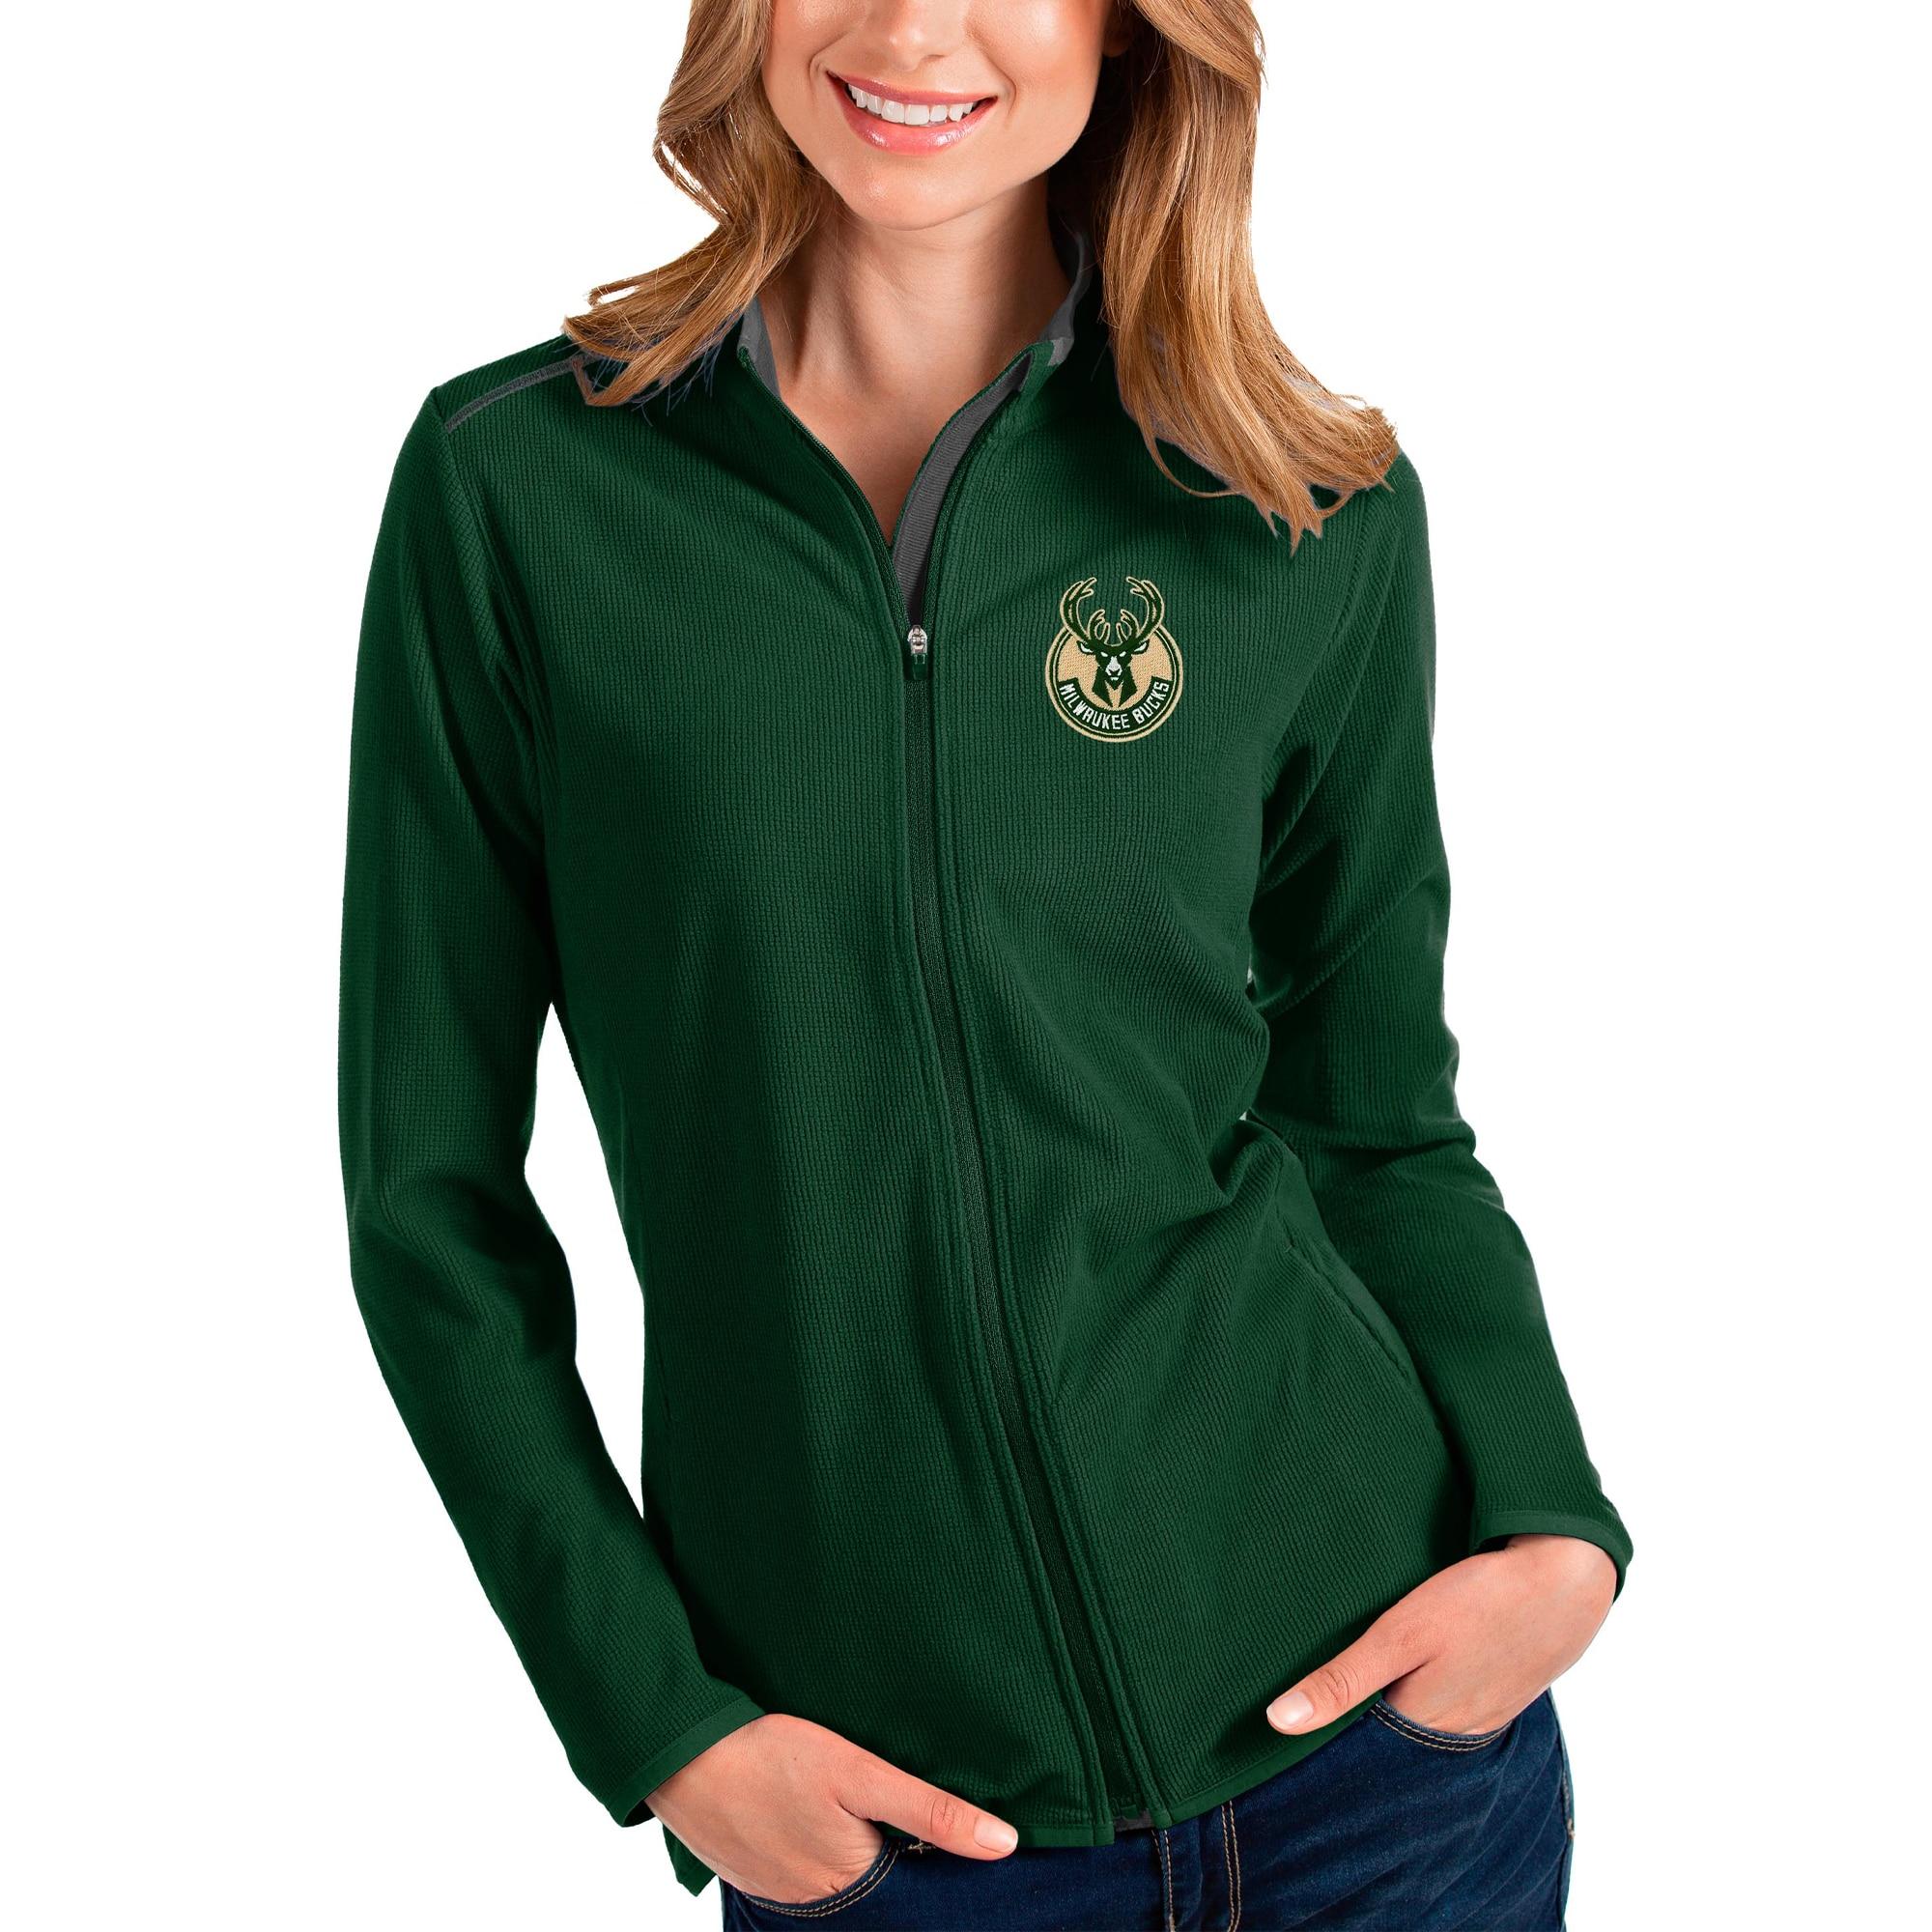 Milwaukee Bucks Antigua Women's Glacier Full-Zip Jacket - Green/Gray